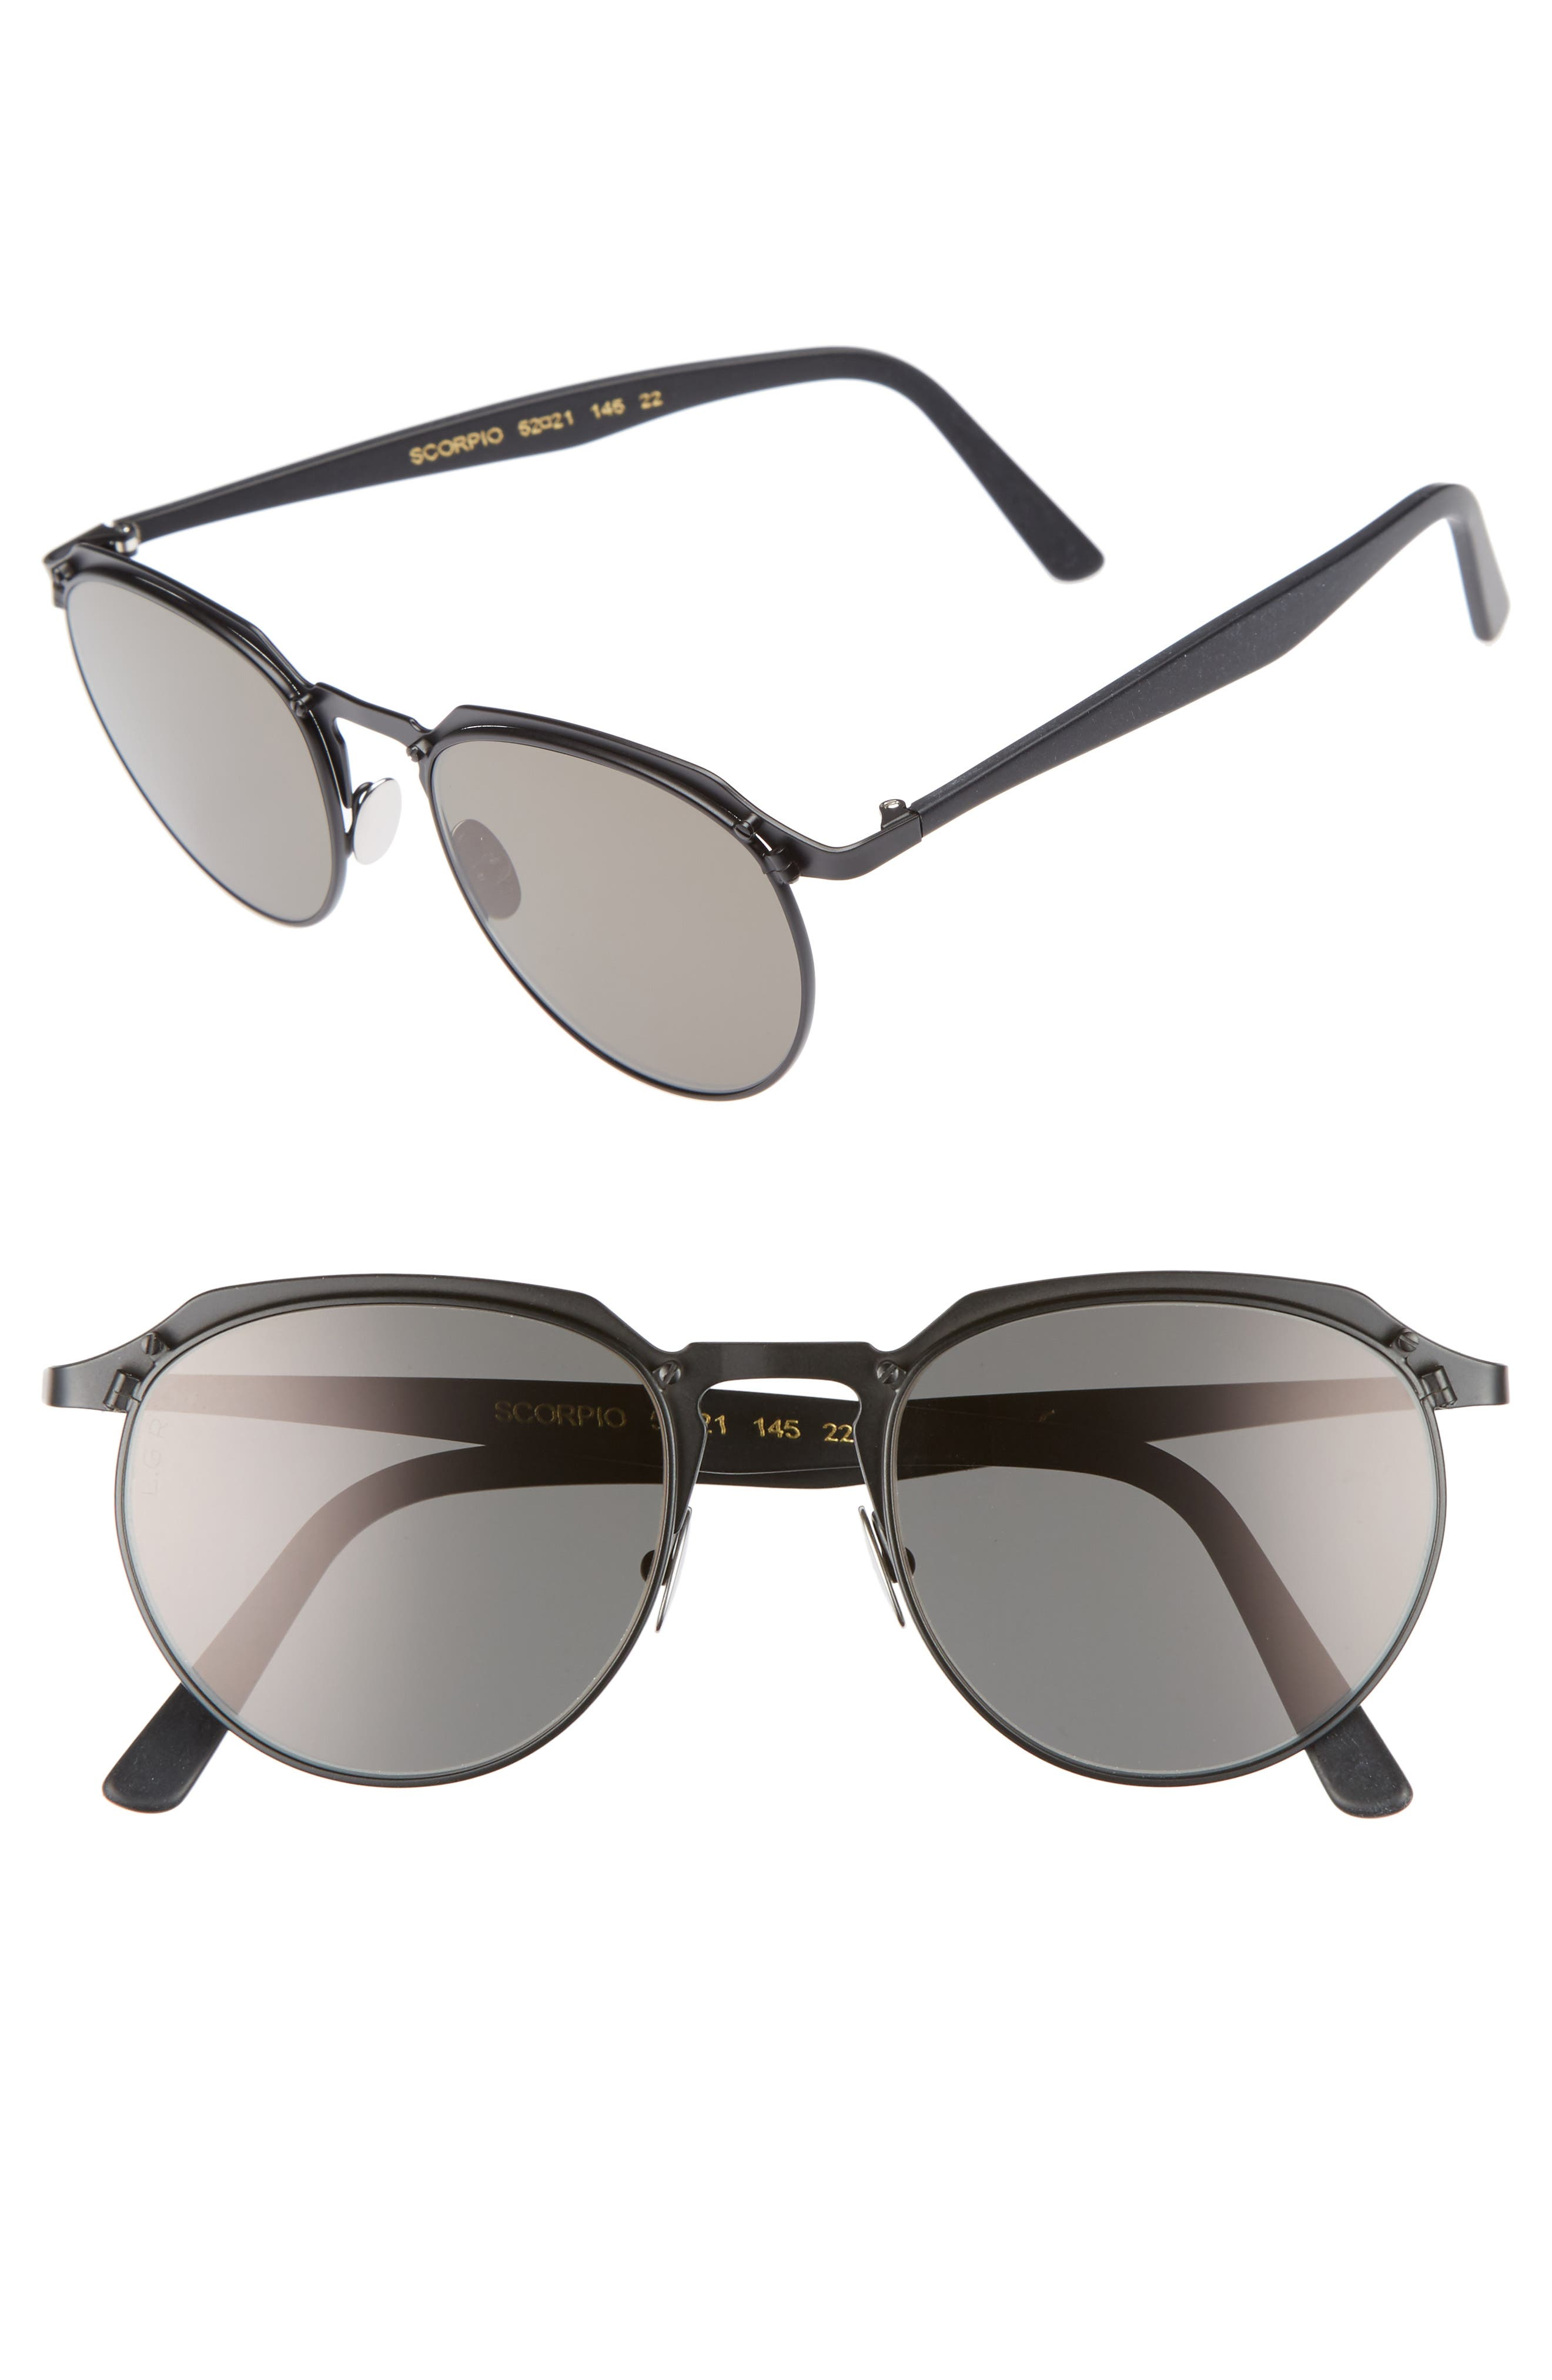 Alternate Image 1 Selected - L.G.R Scorpio 52mm Sunglasses